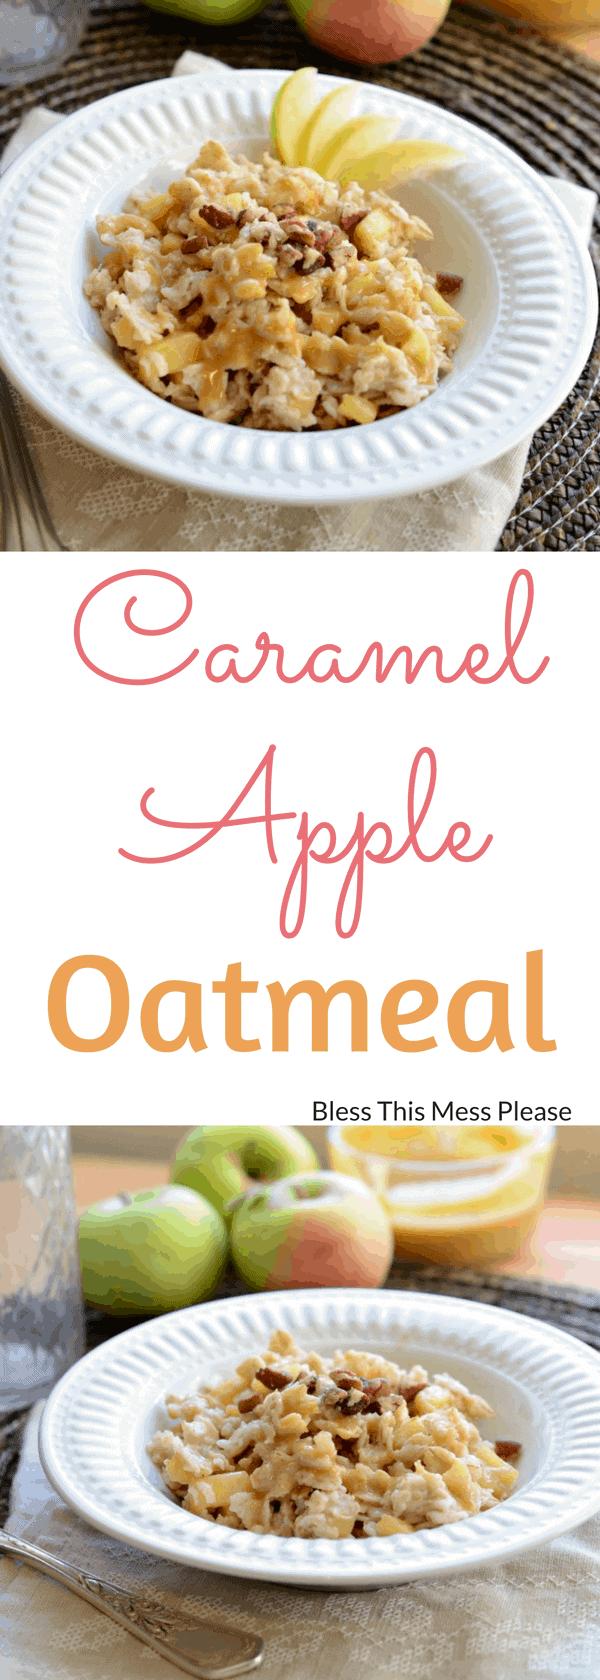 Caramel Apple Oatmeal